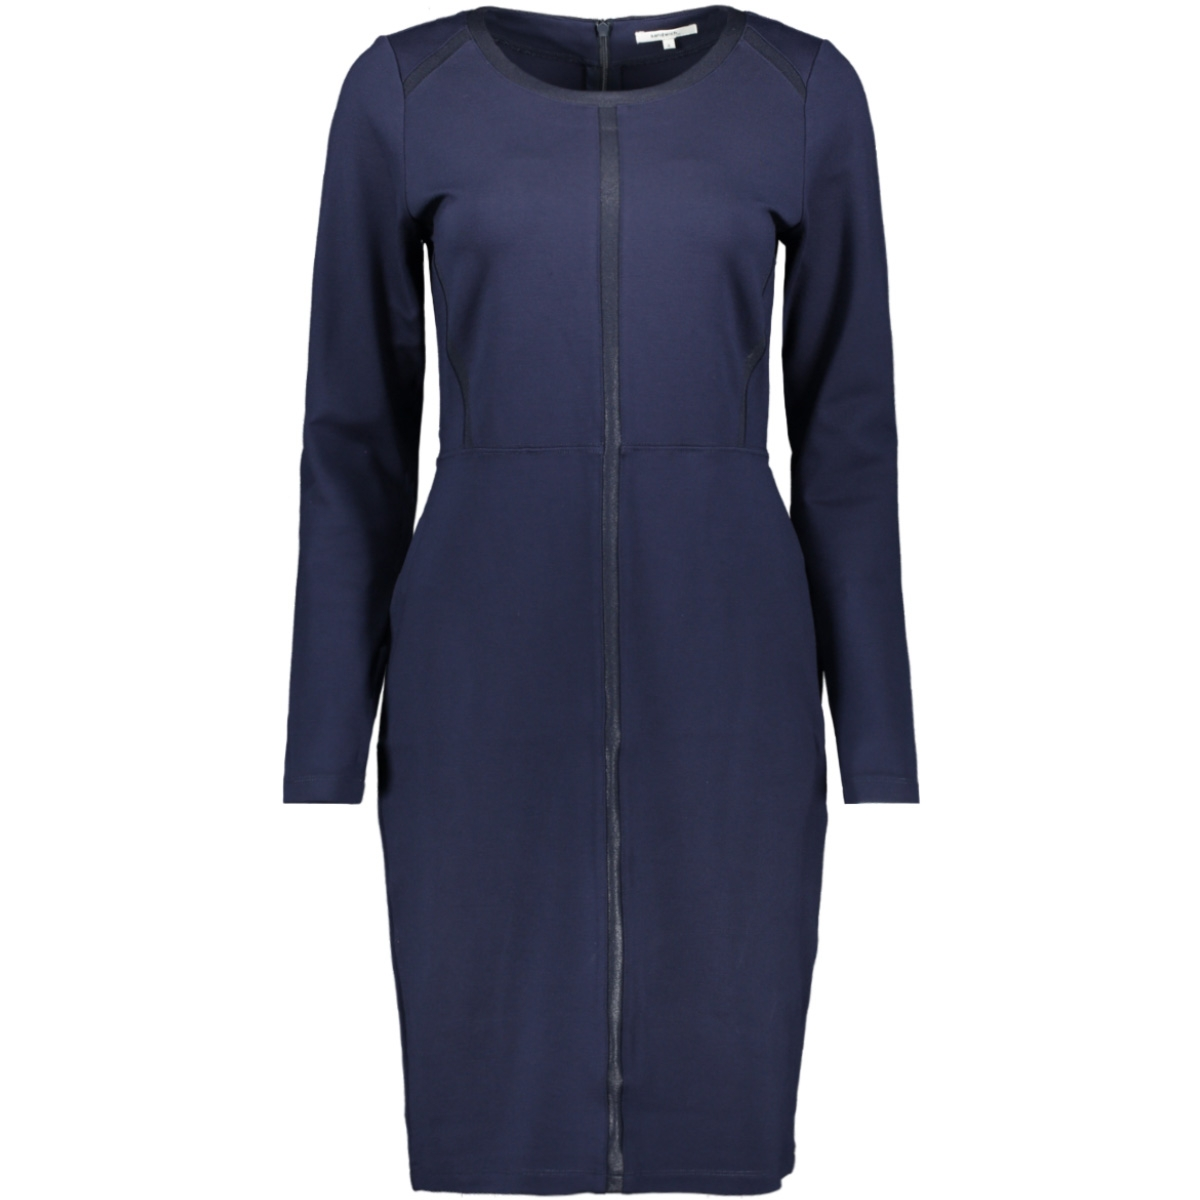 a lijn jurk met gecoate bies 23001667 sandwich jurk 40153